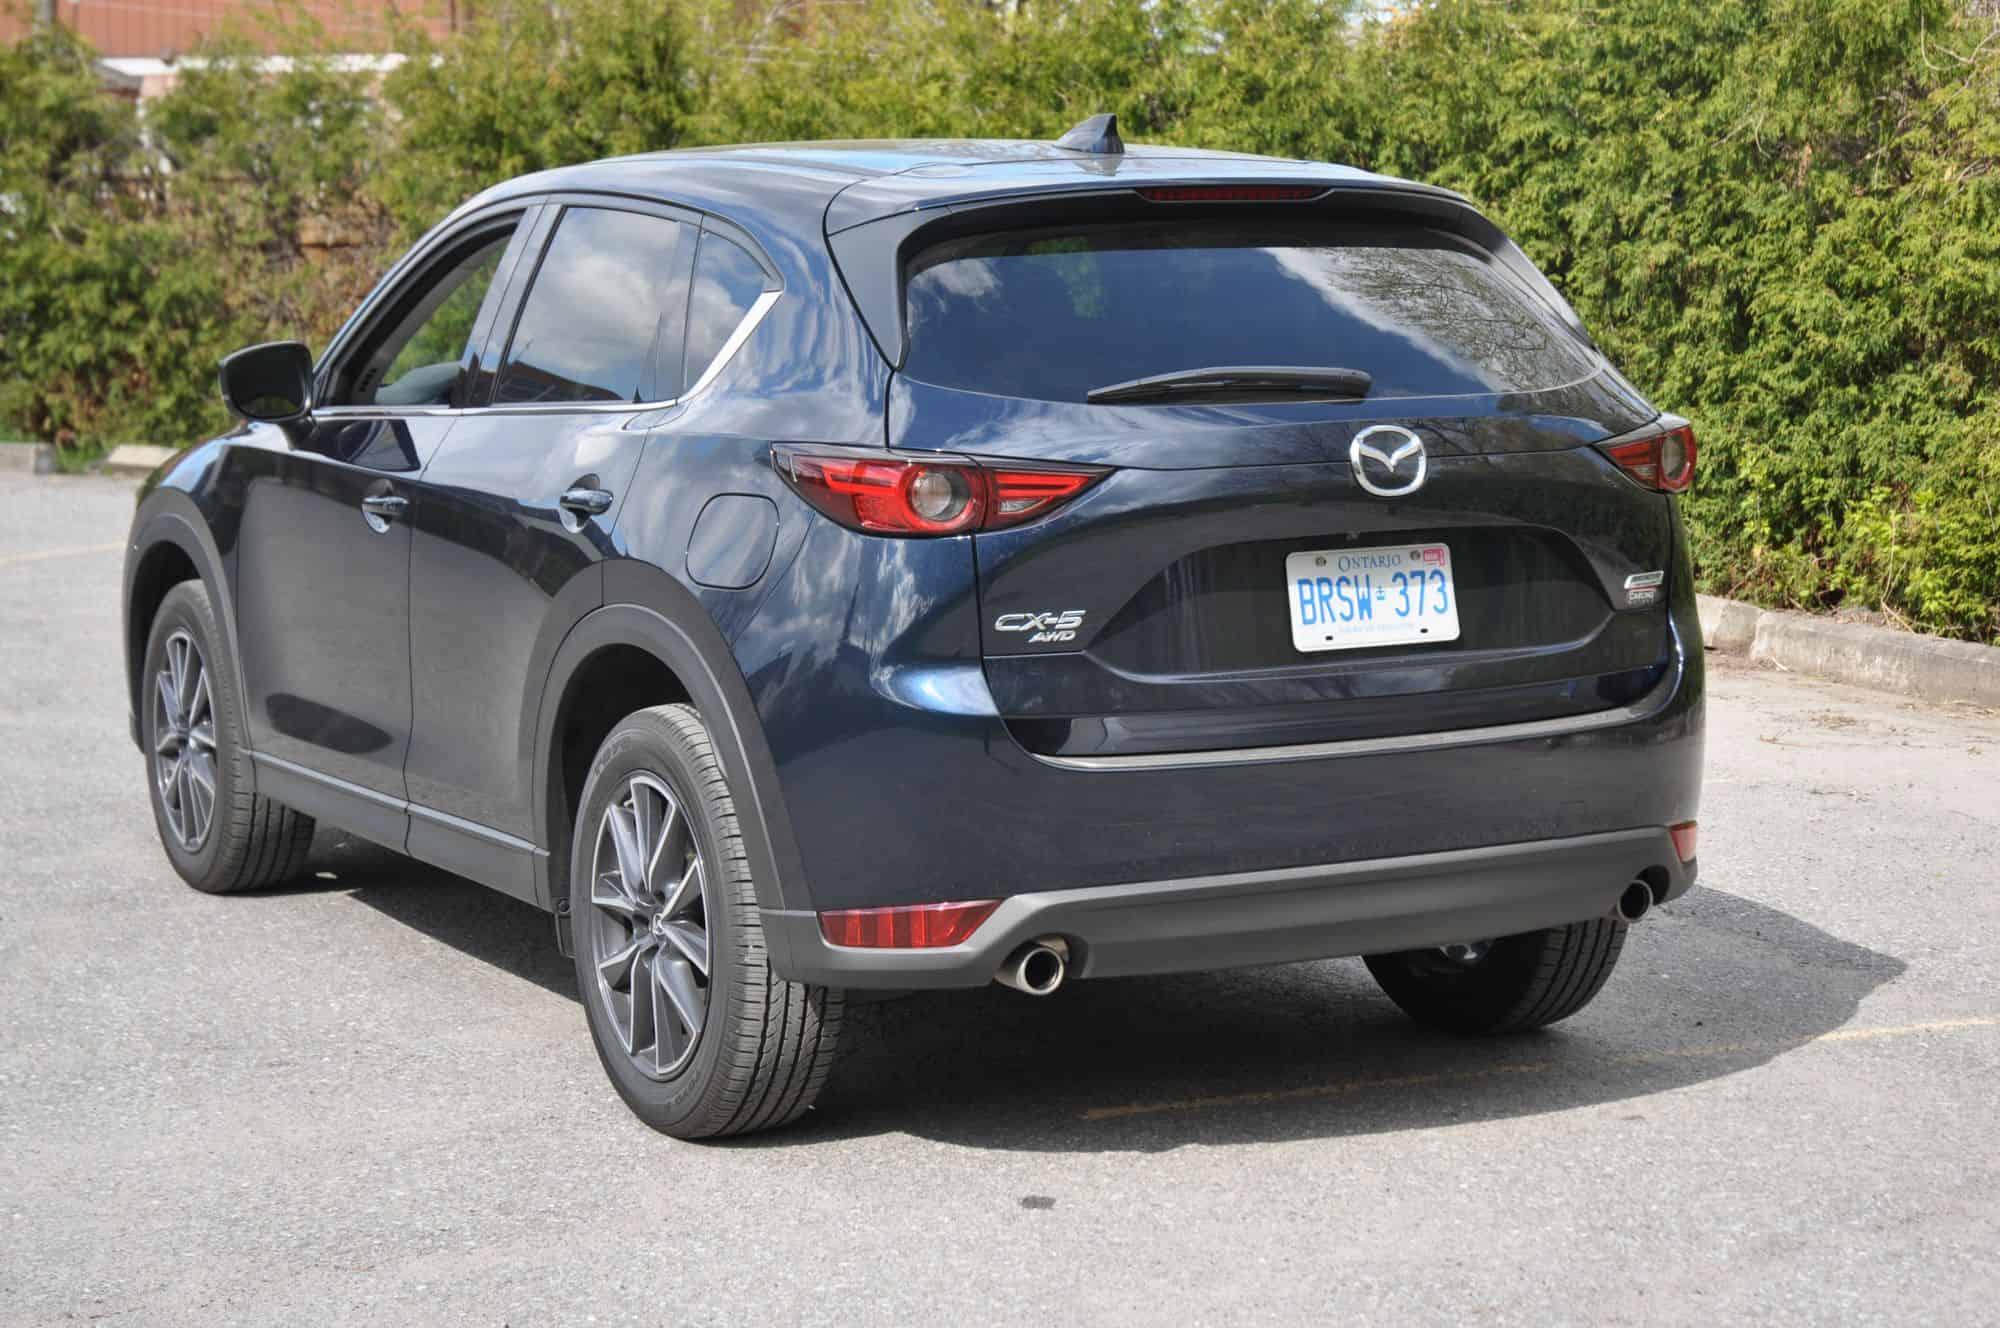 2017 Mazda CX5 – Gone Driving